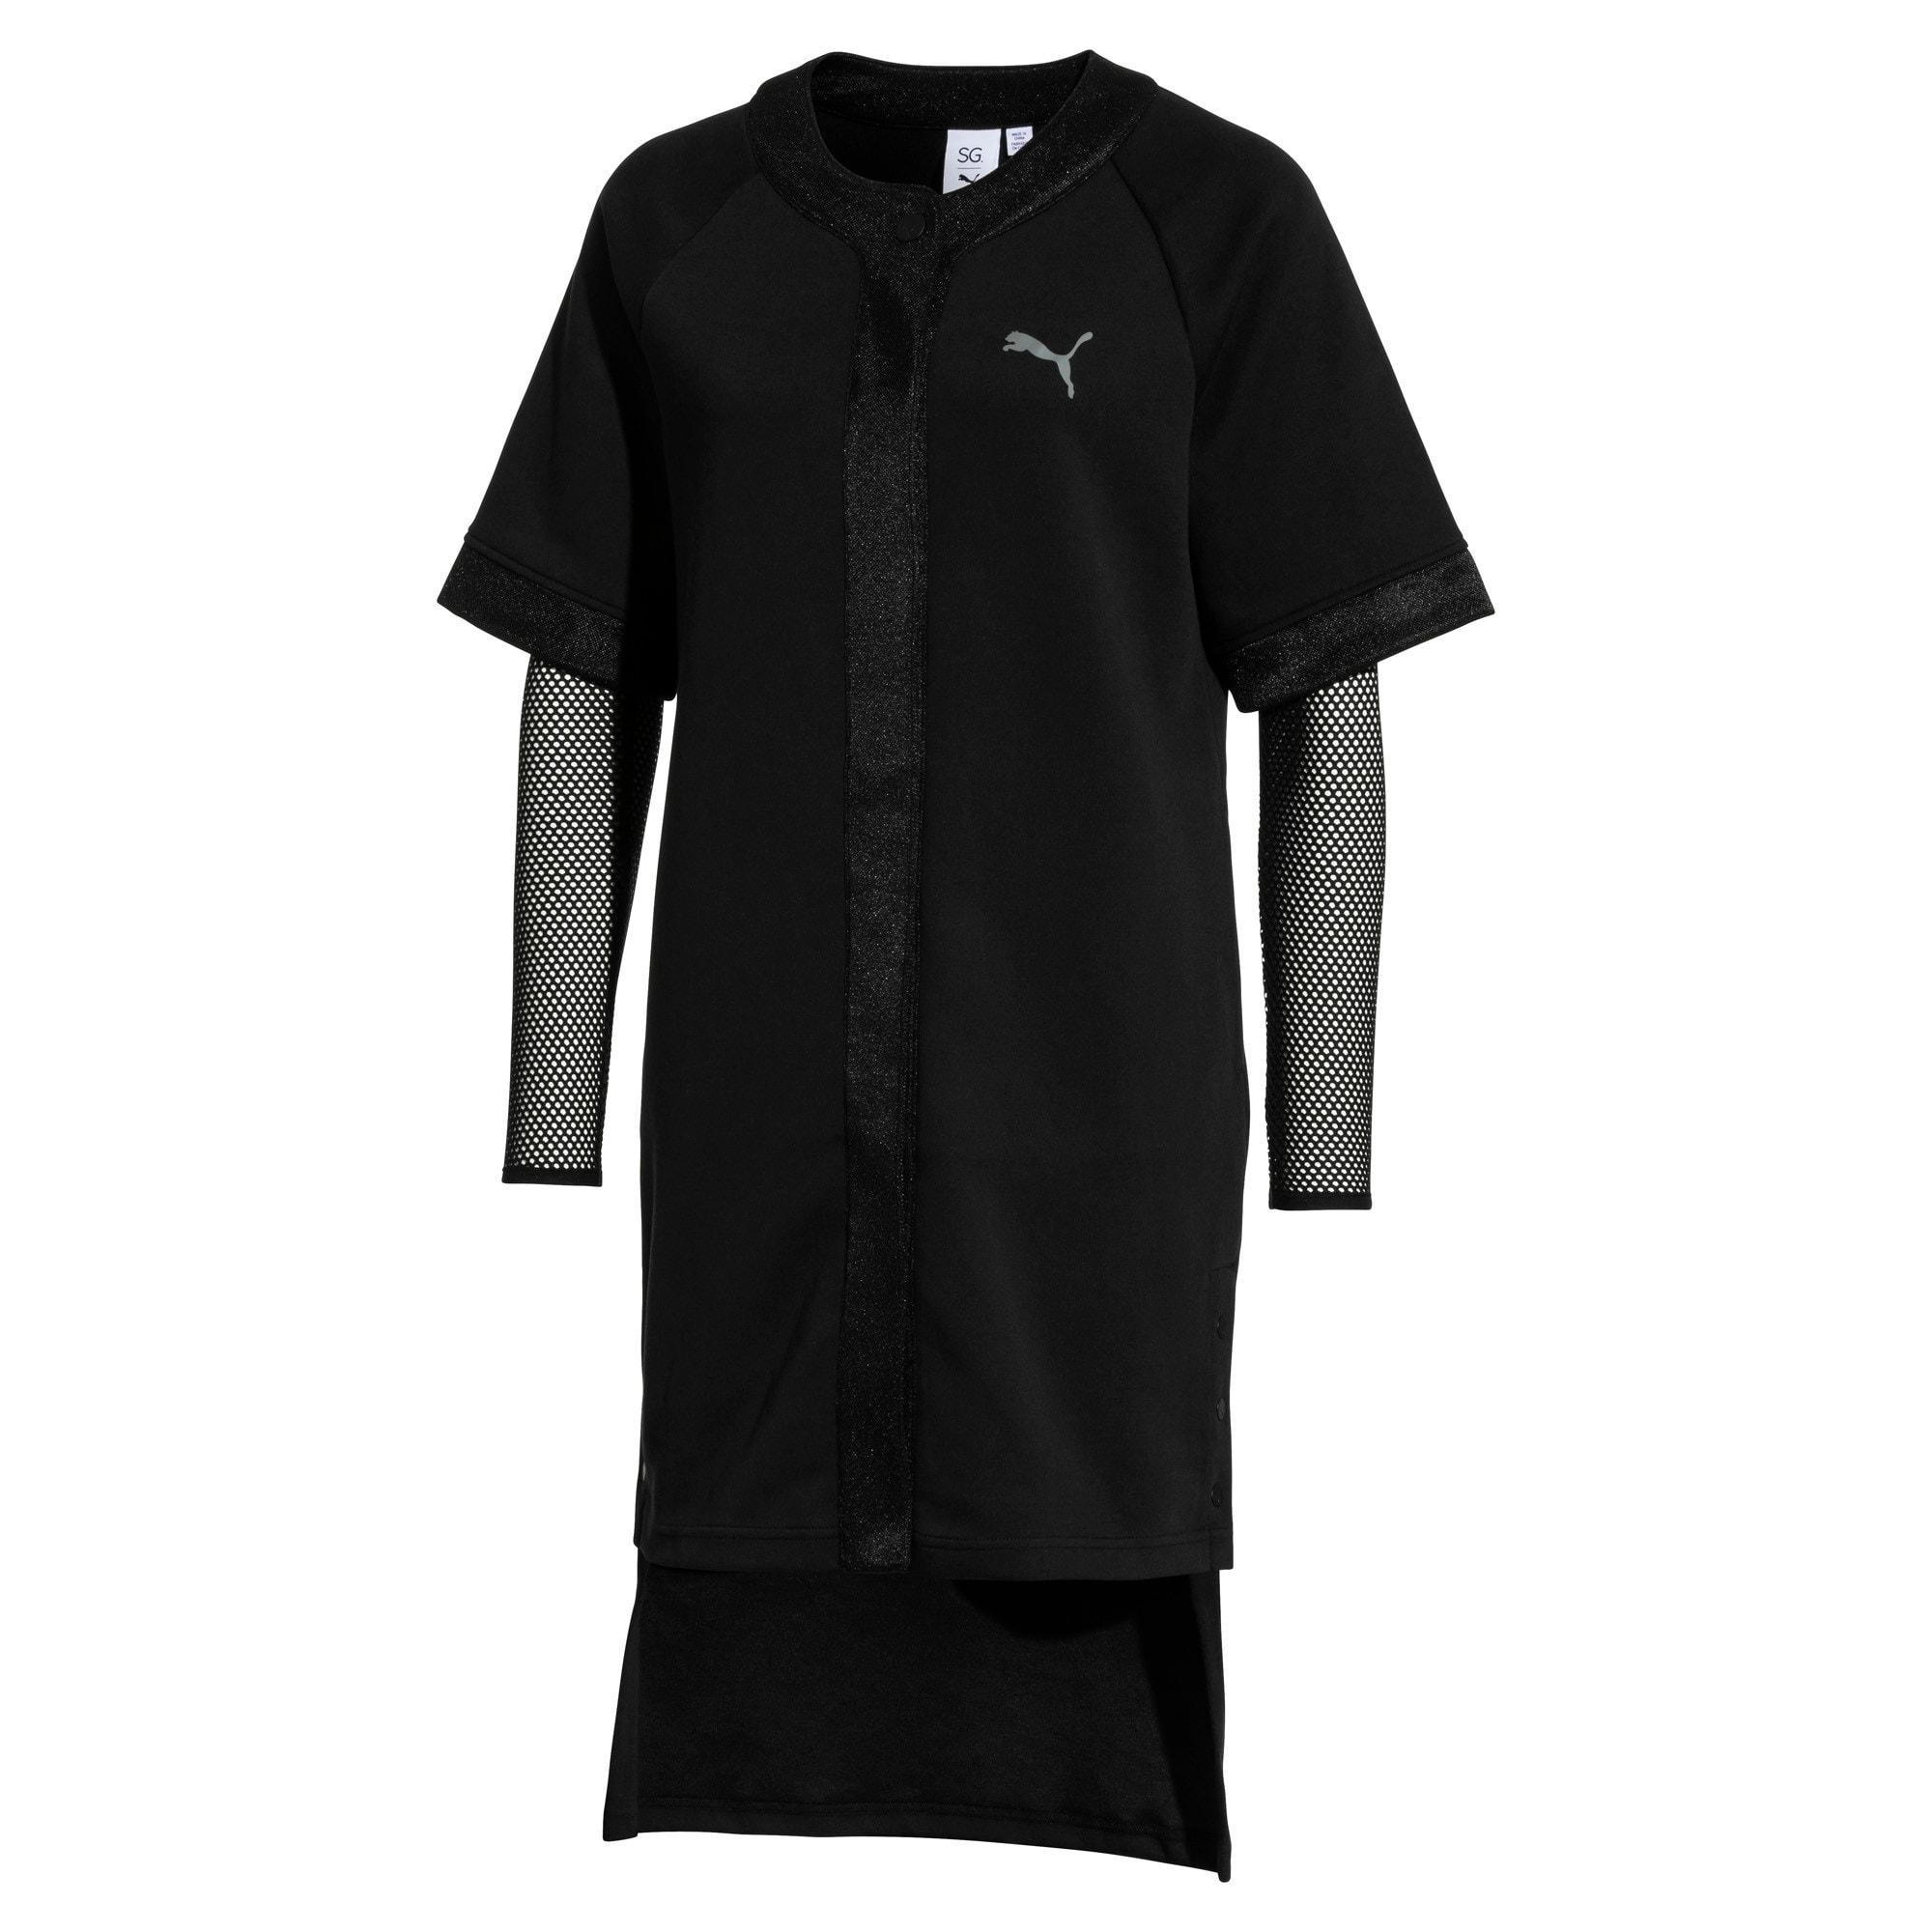 Thumbnail 6 of SG x PUMA Dress, Puma Black, medium